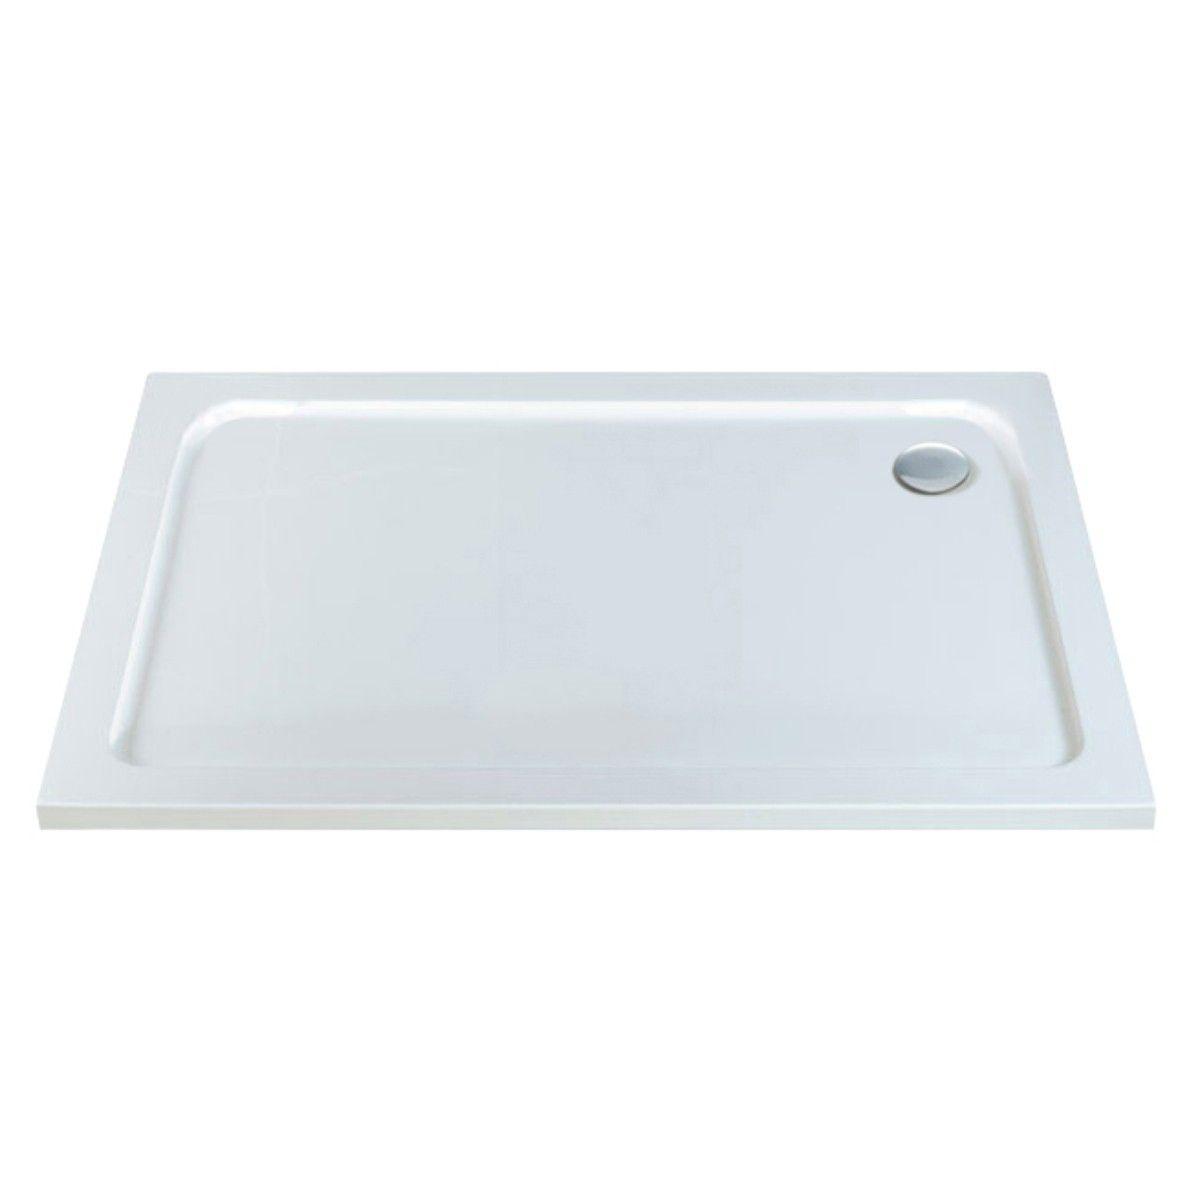 Emerald Slimline Rectangular Shower Tray 1200 x 900 | Trays ...